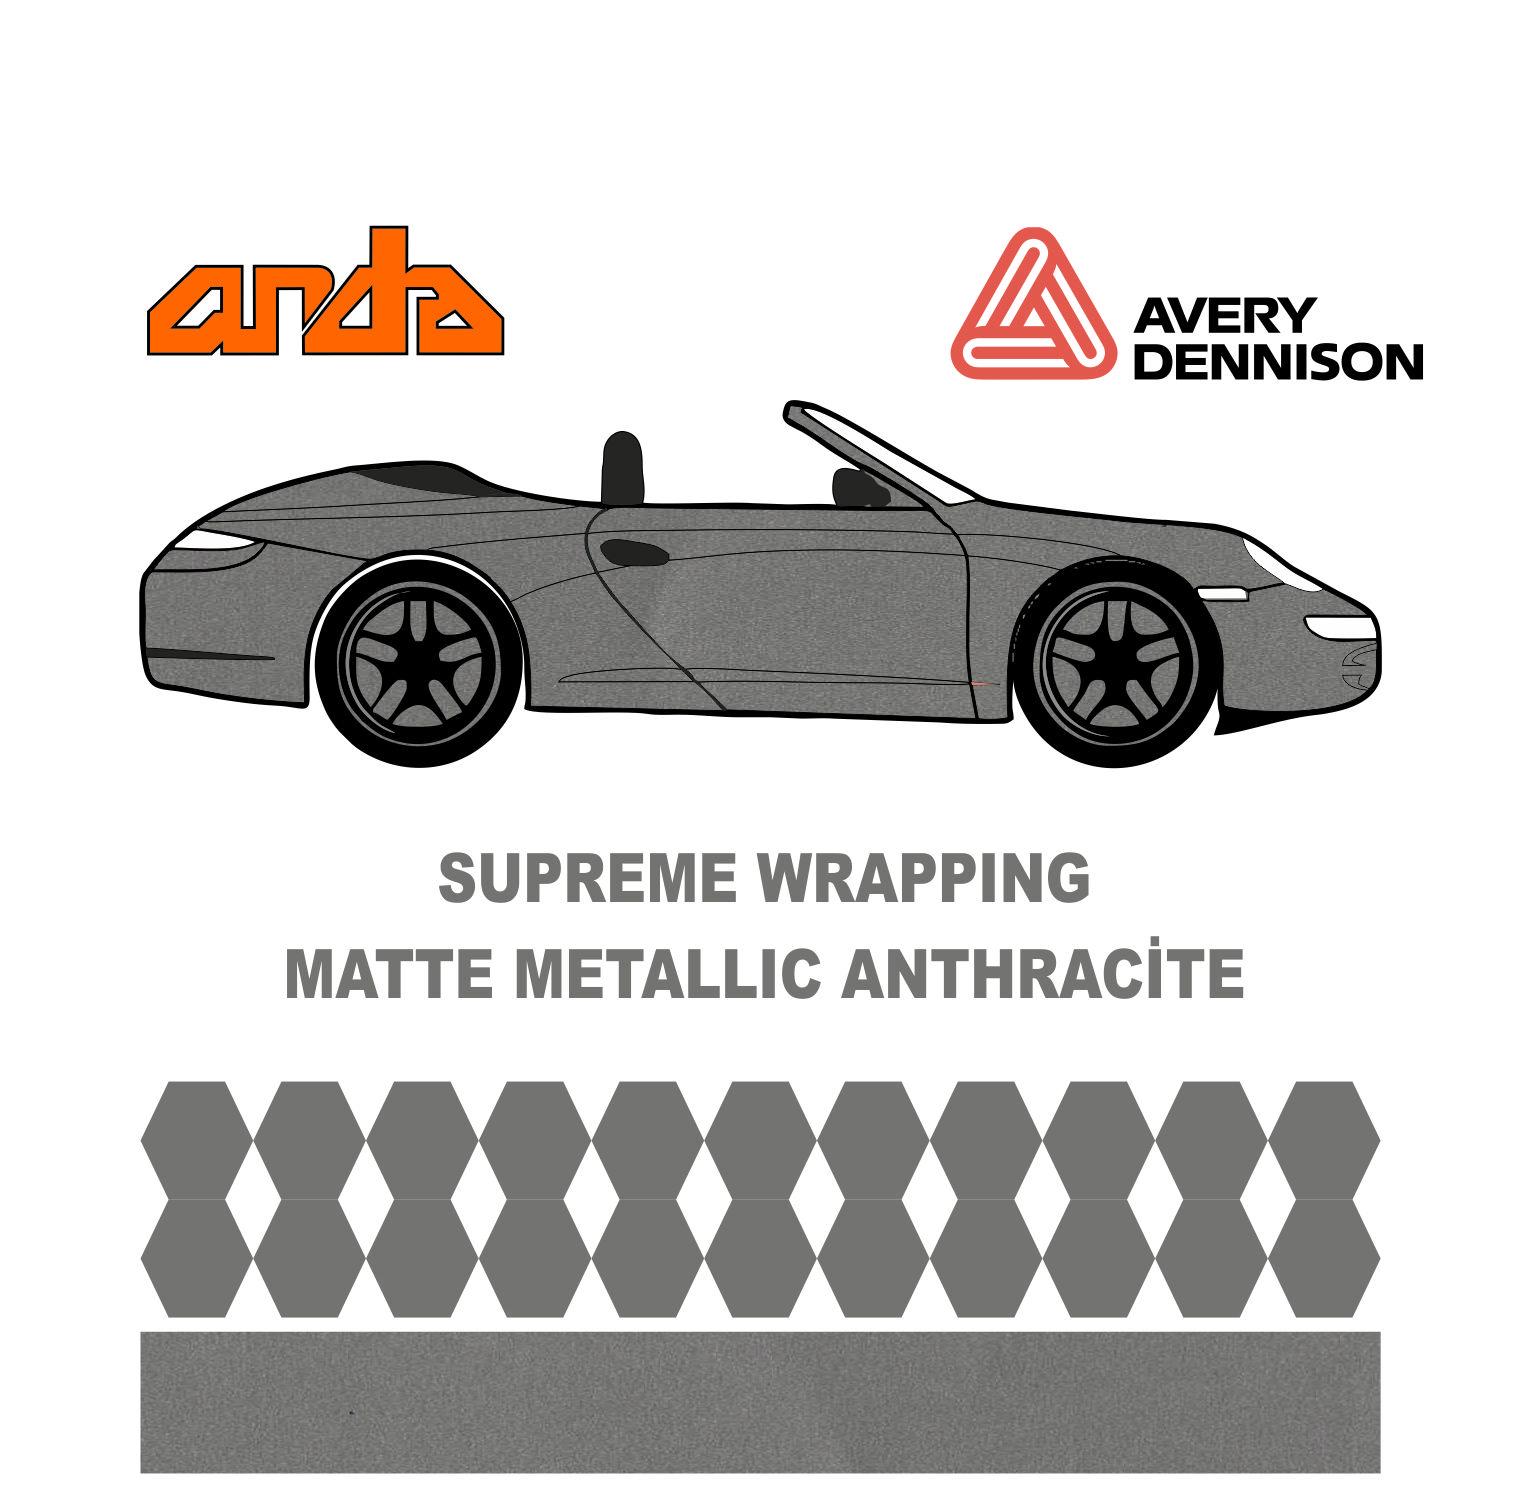 Avery Dennison- SWF Matte Metallic Antracite 1